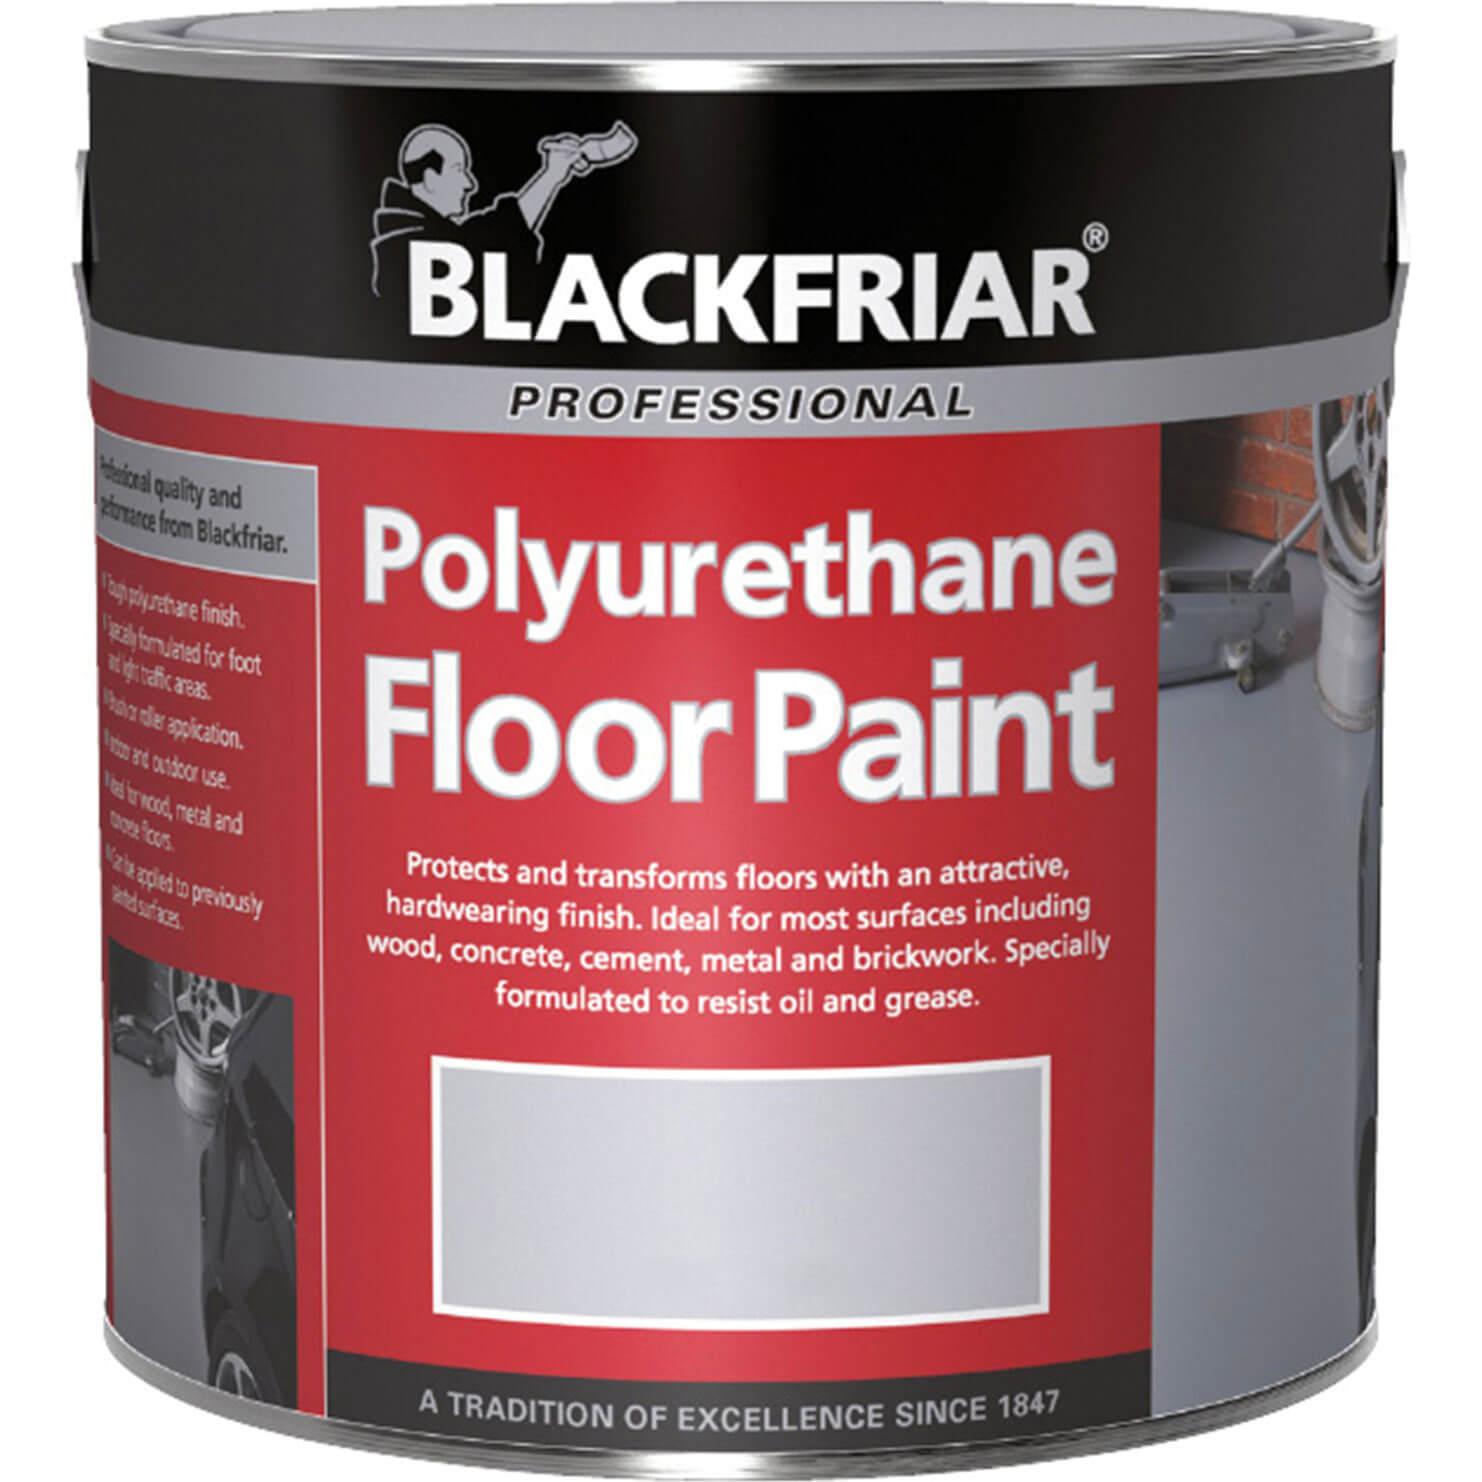 Image of Blackfriar Professional Polyurethane Floor Paint Tile Red 1l